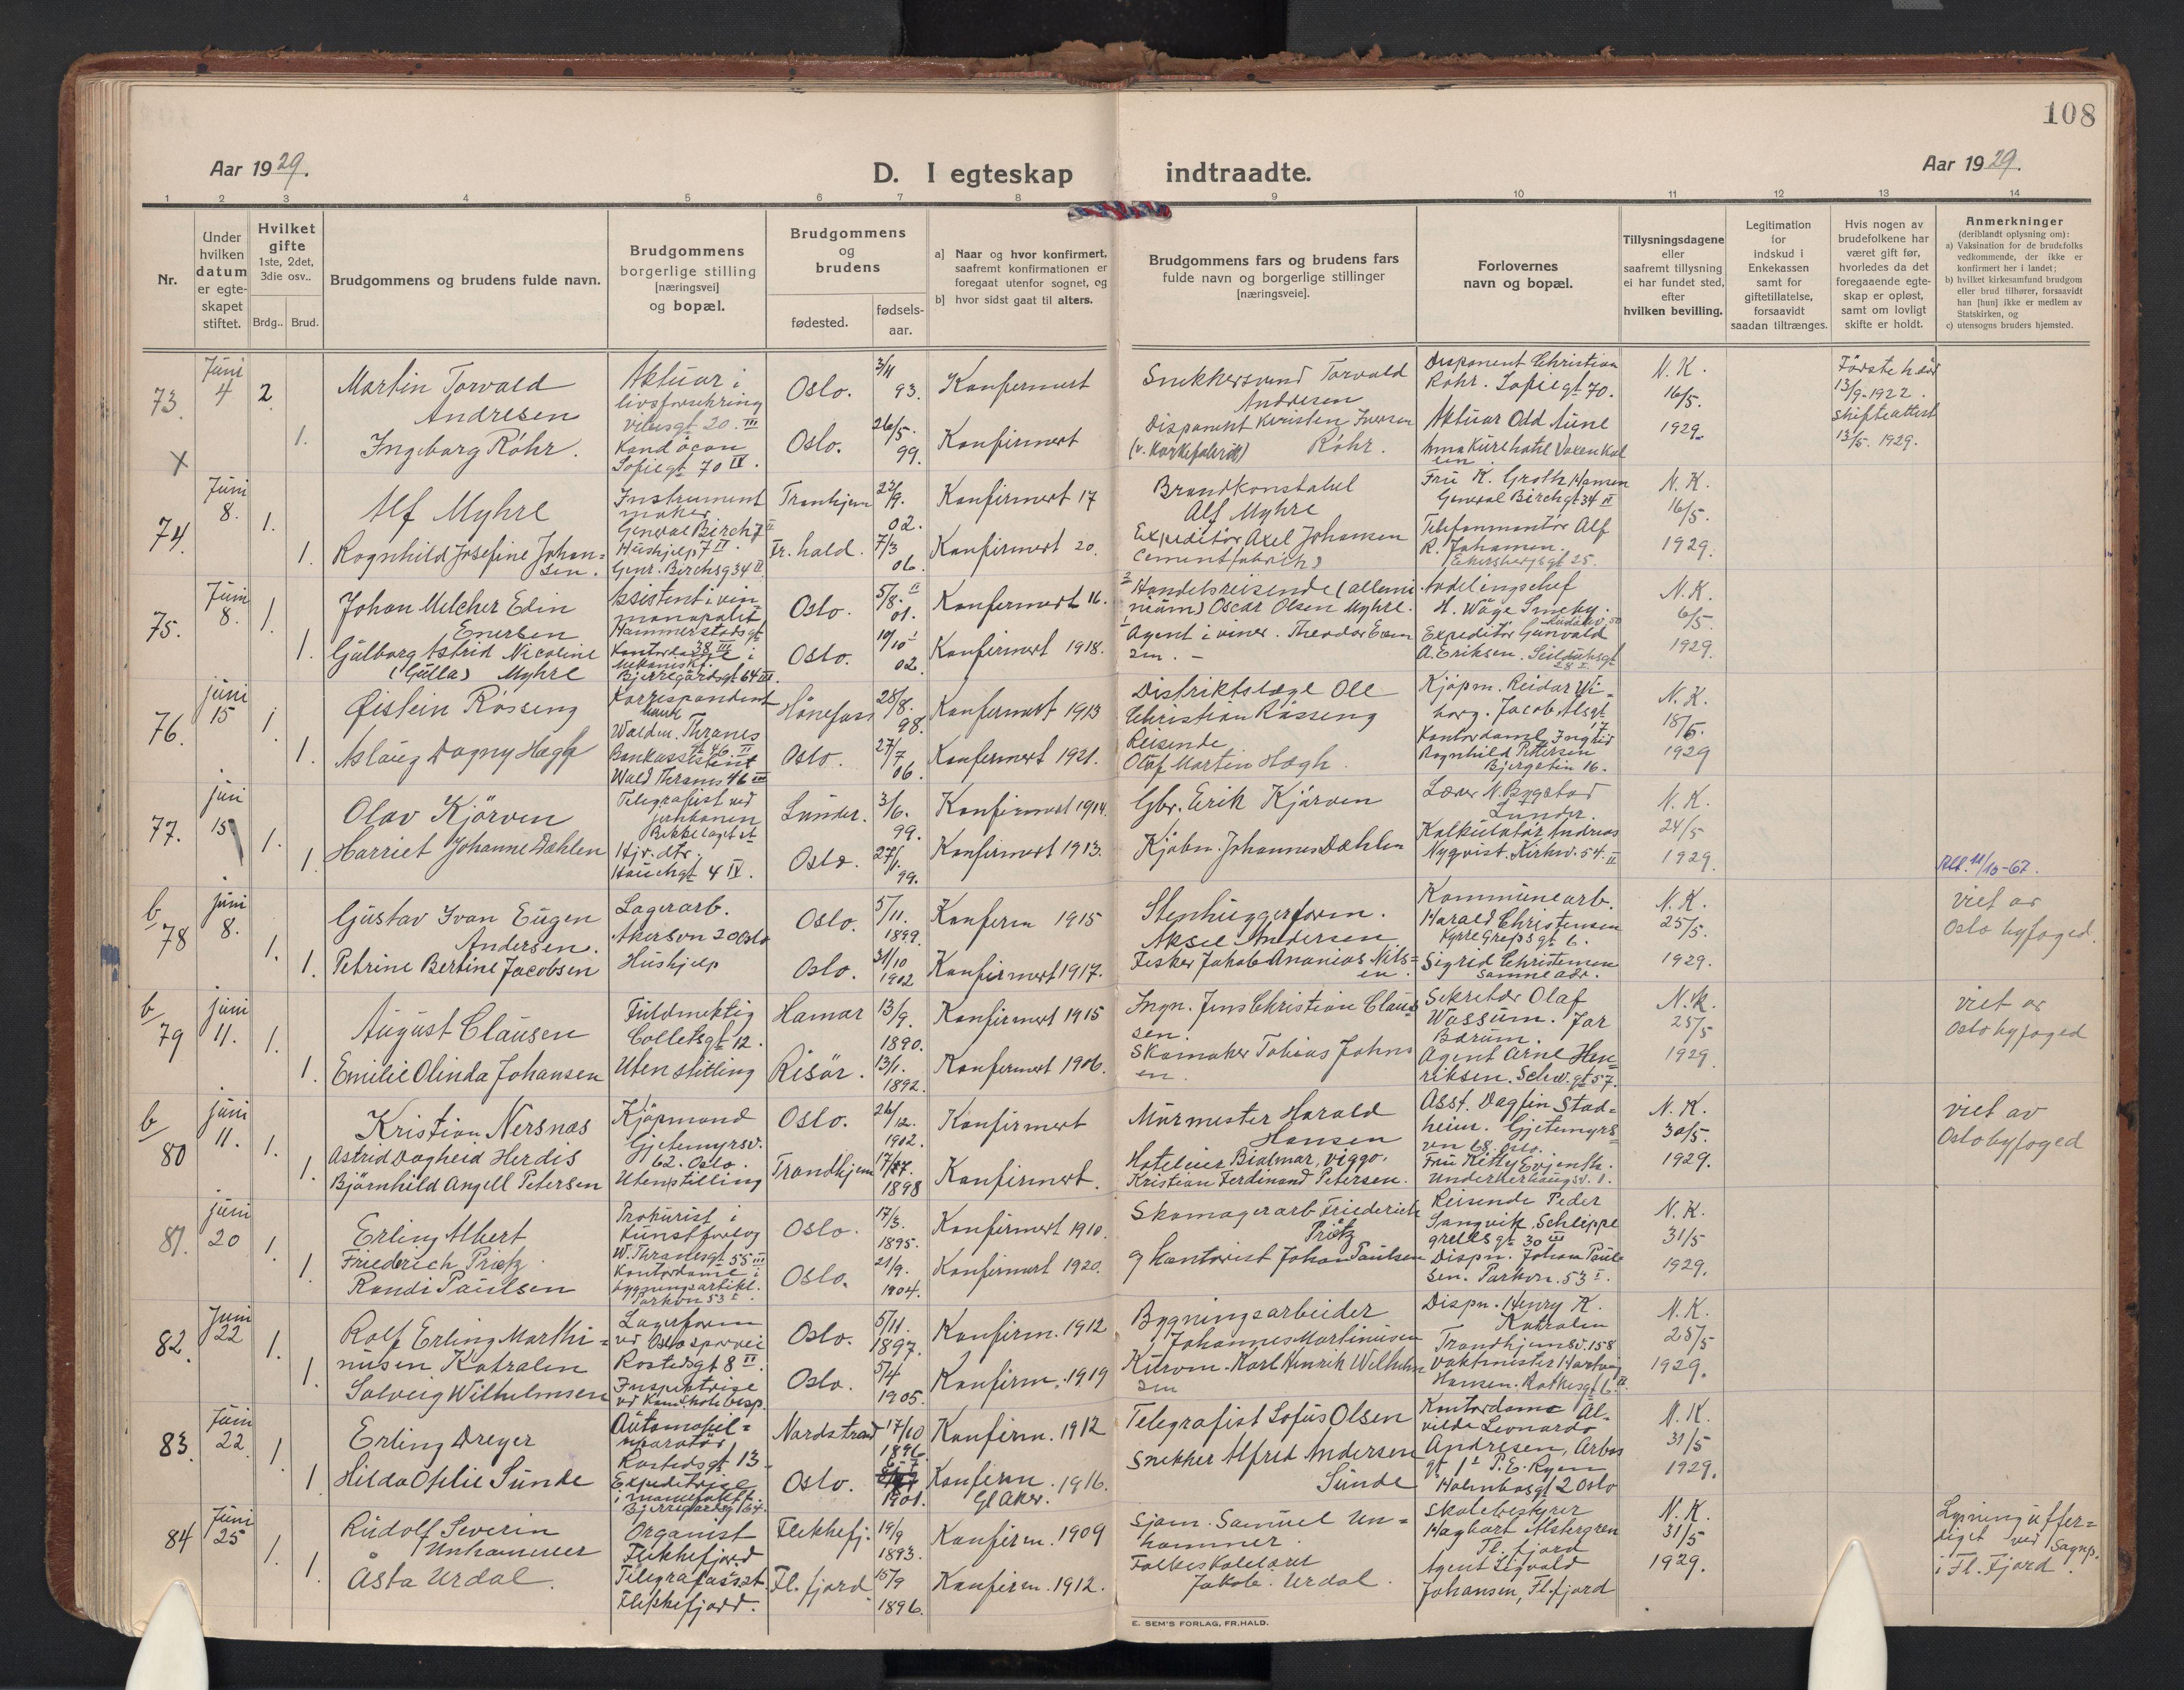 SAO, Gamle Aker prestekontor Kirkebøker, F/L0017: Parish register (official) no. 17, 1921-1931, p. 108